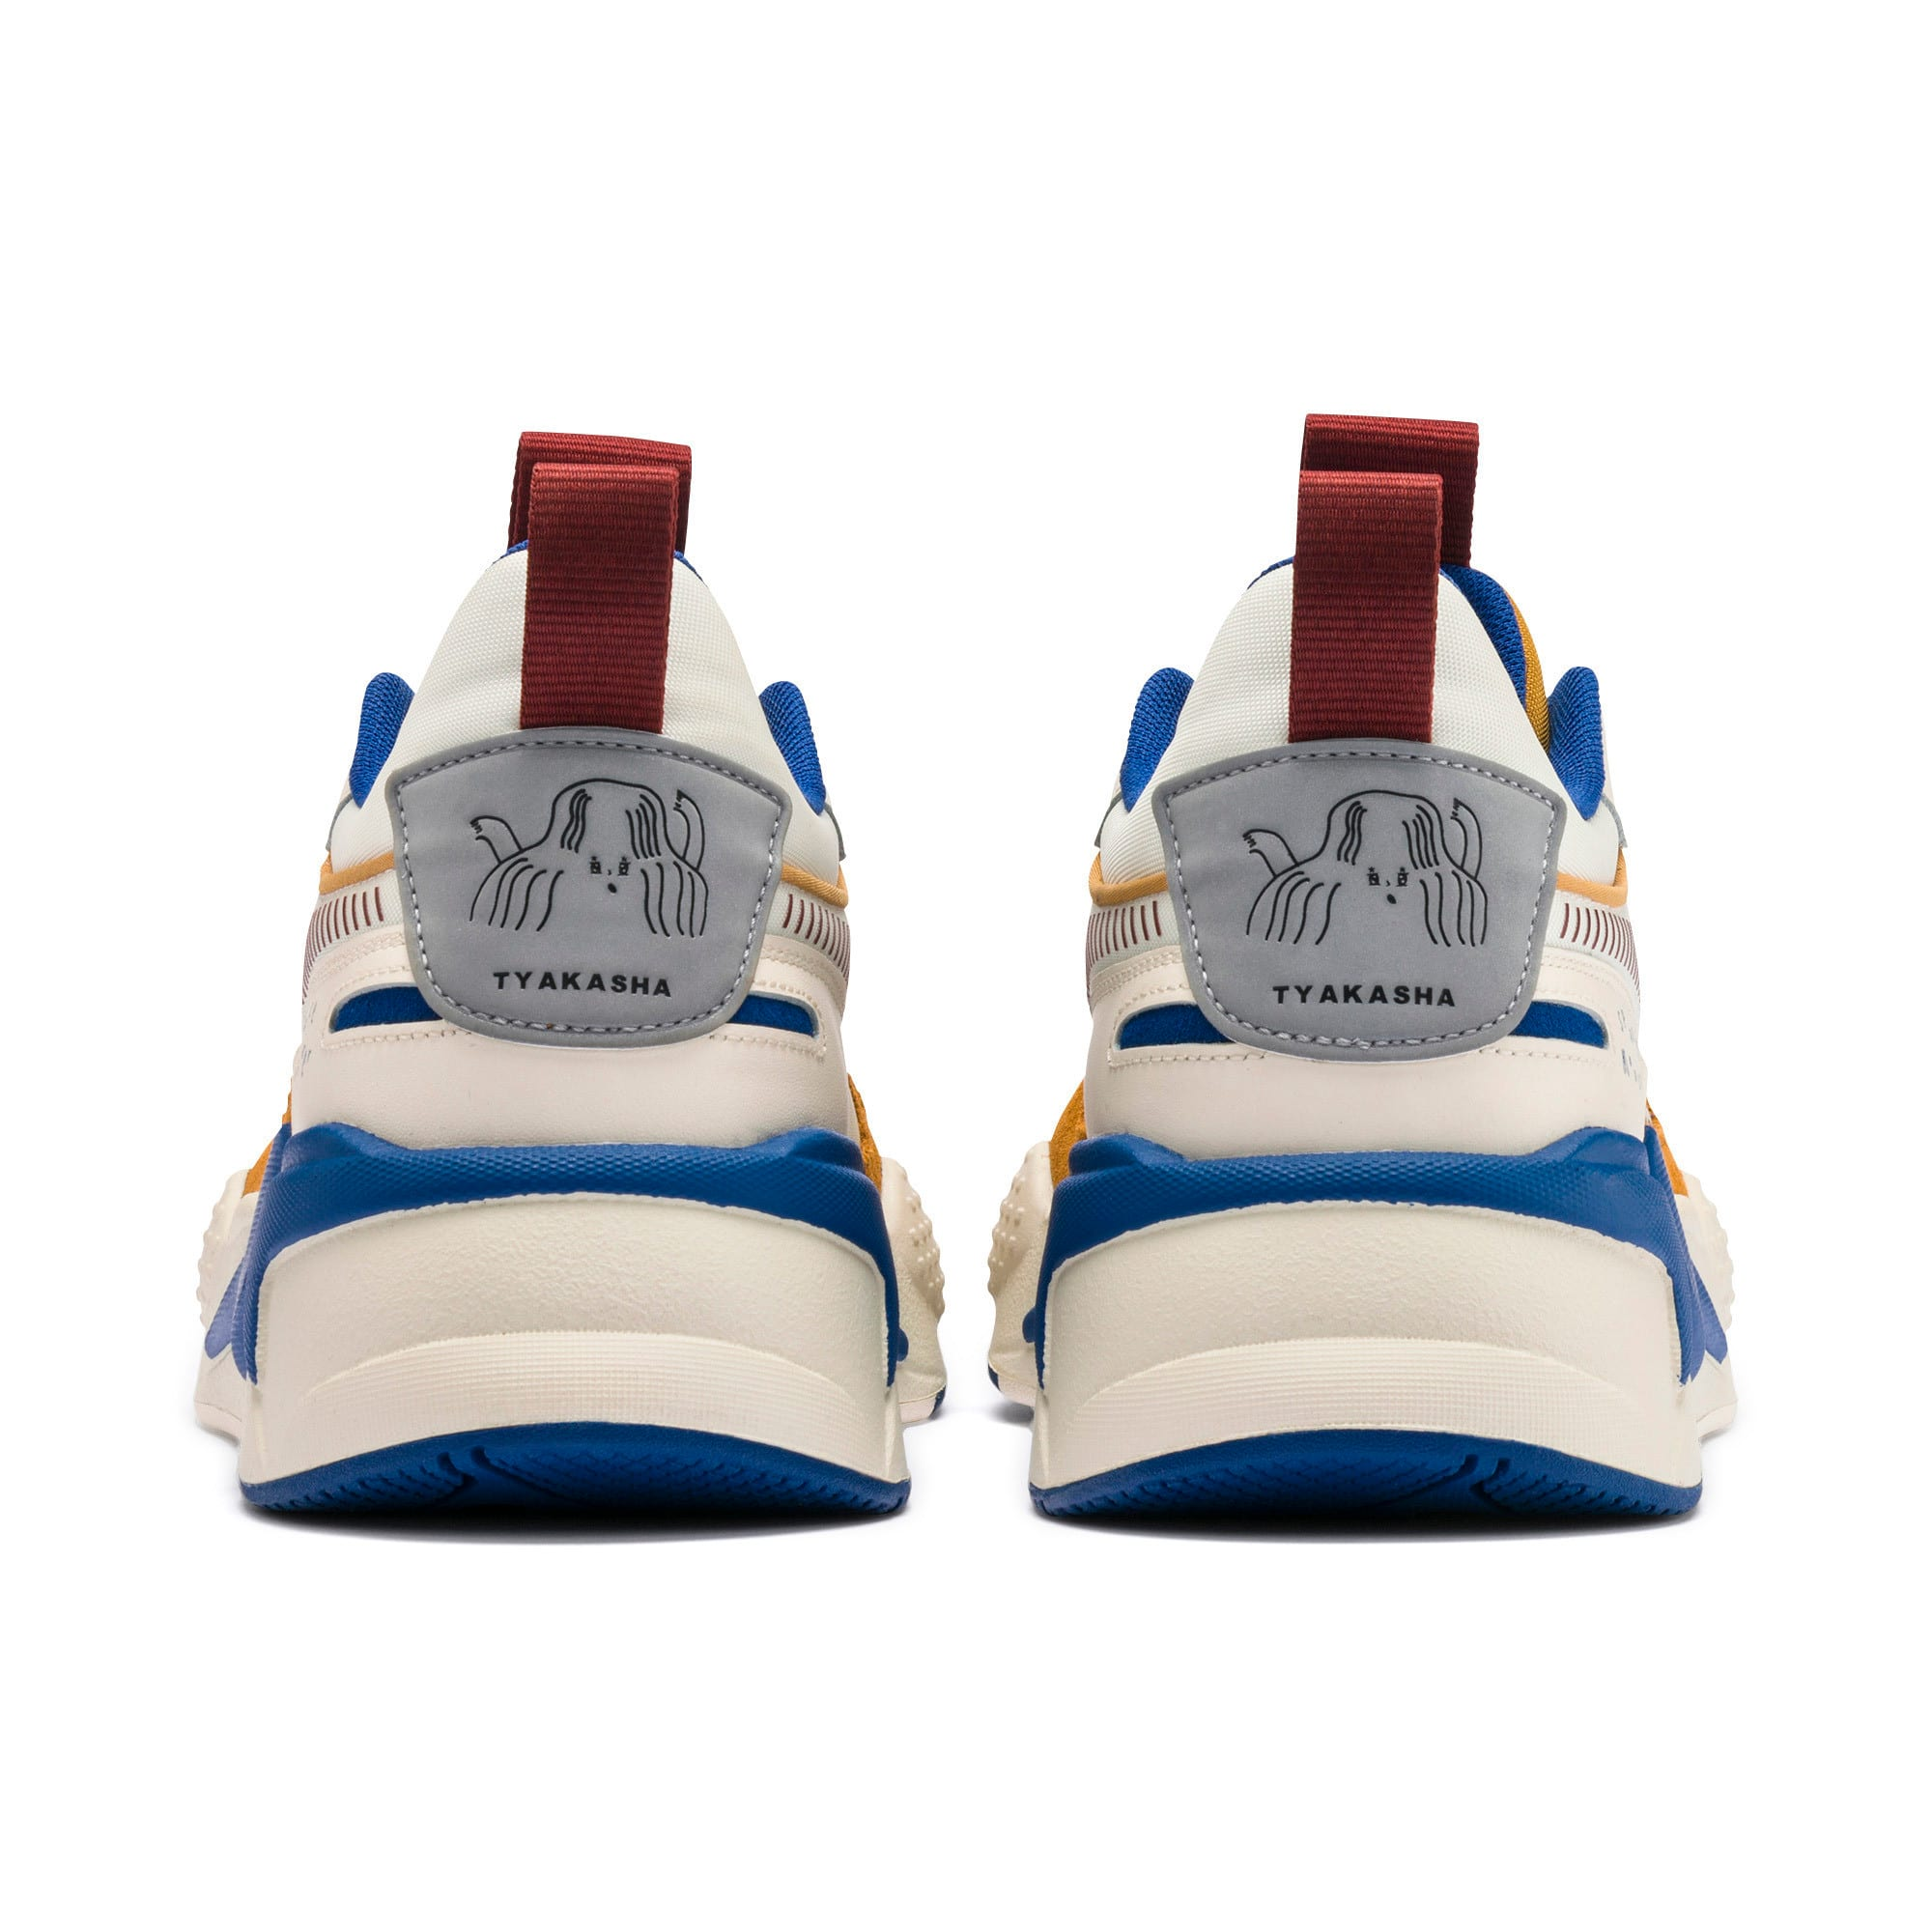 Thumbnail 5 of PUMA x TYAKASHA RS-X Sneakers, Whisper White-Fired Brick, medium